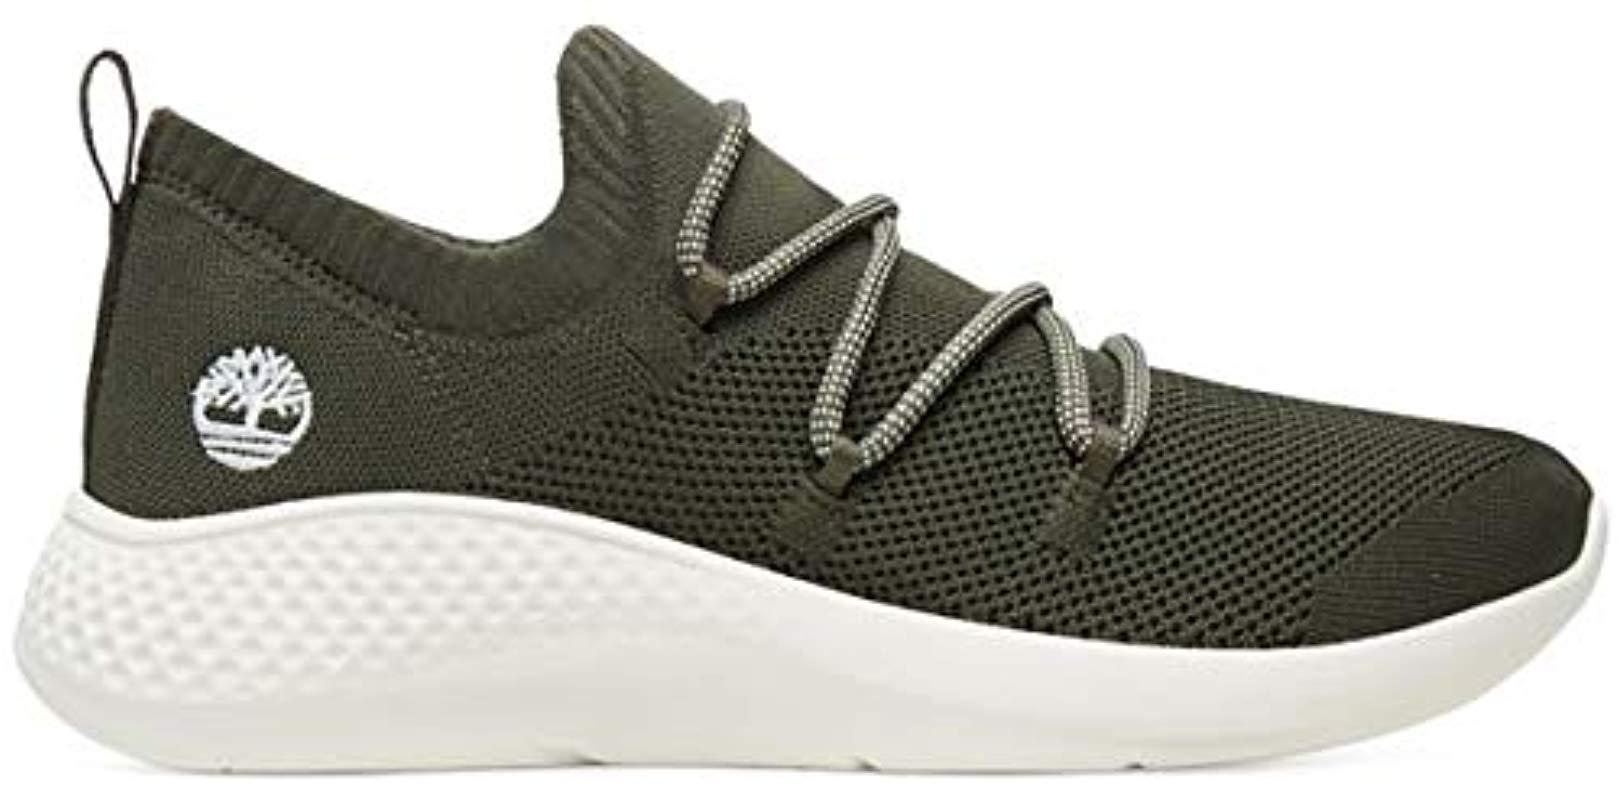 a50443b5a womens sport shoes timberland a1ugg flyroam color